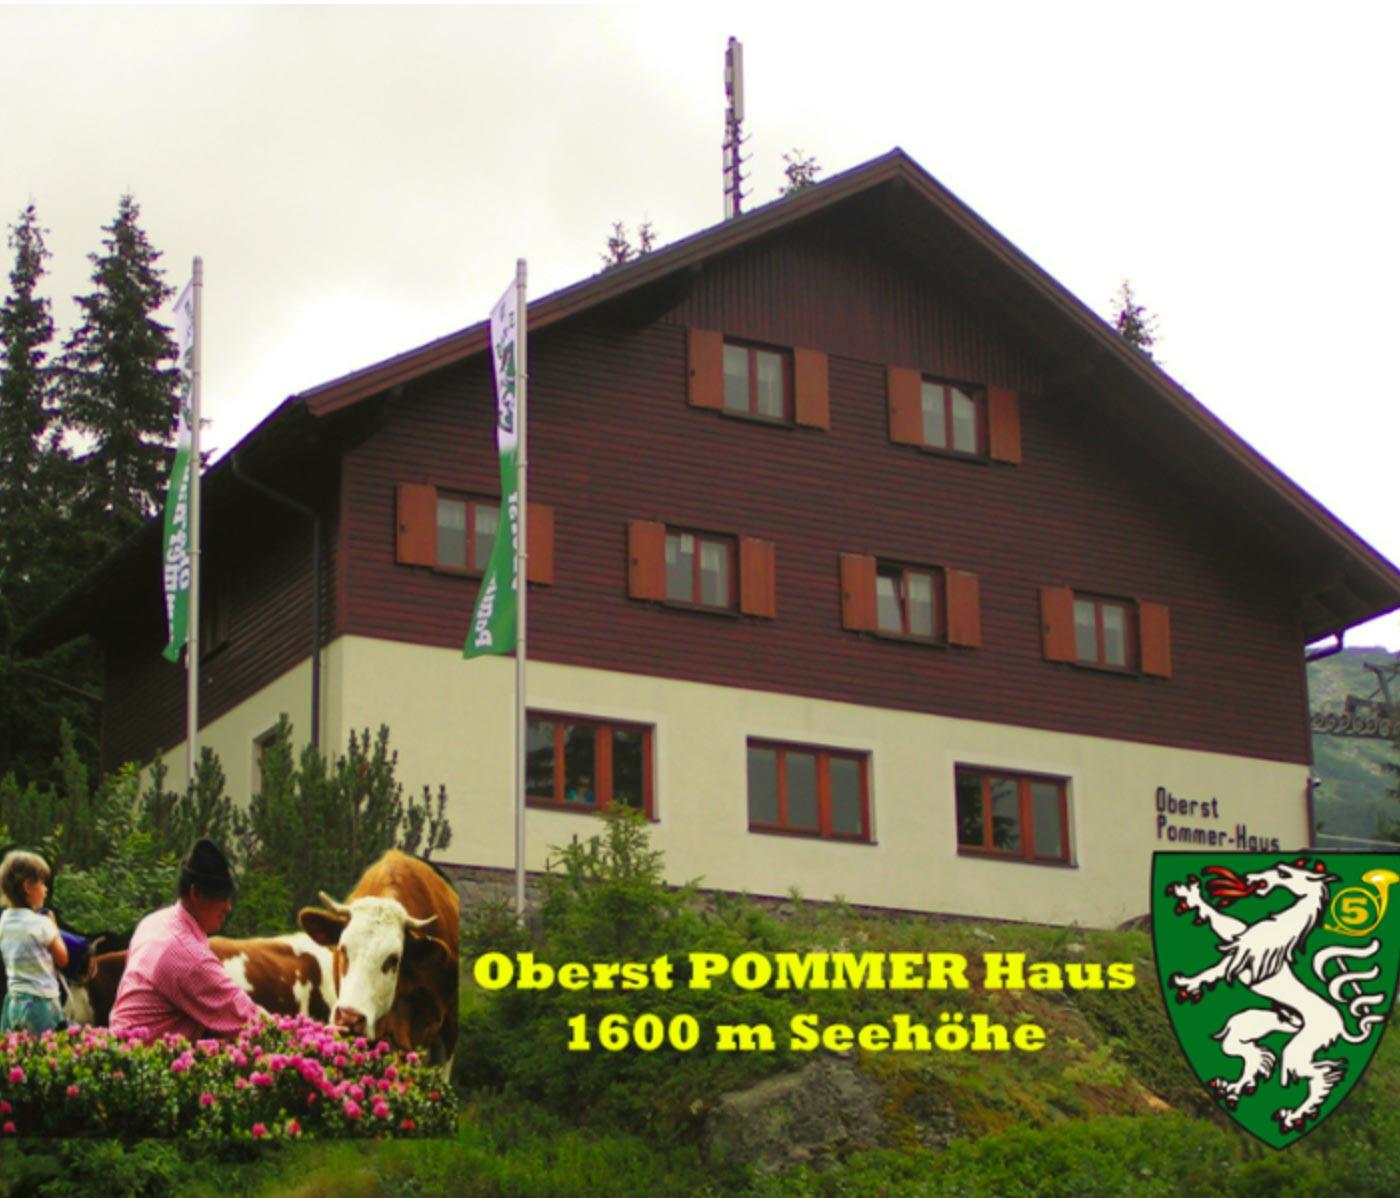 bg-oberstpommehaus